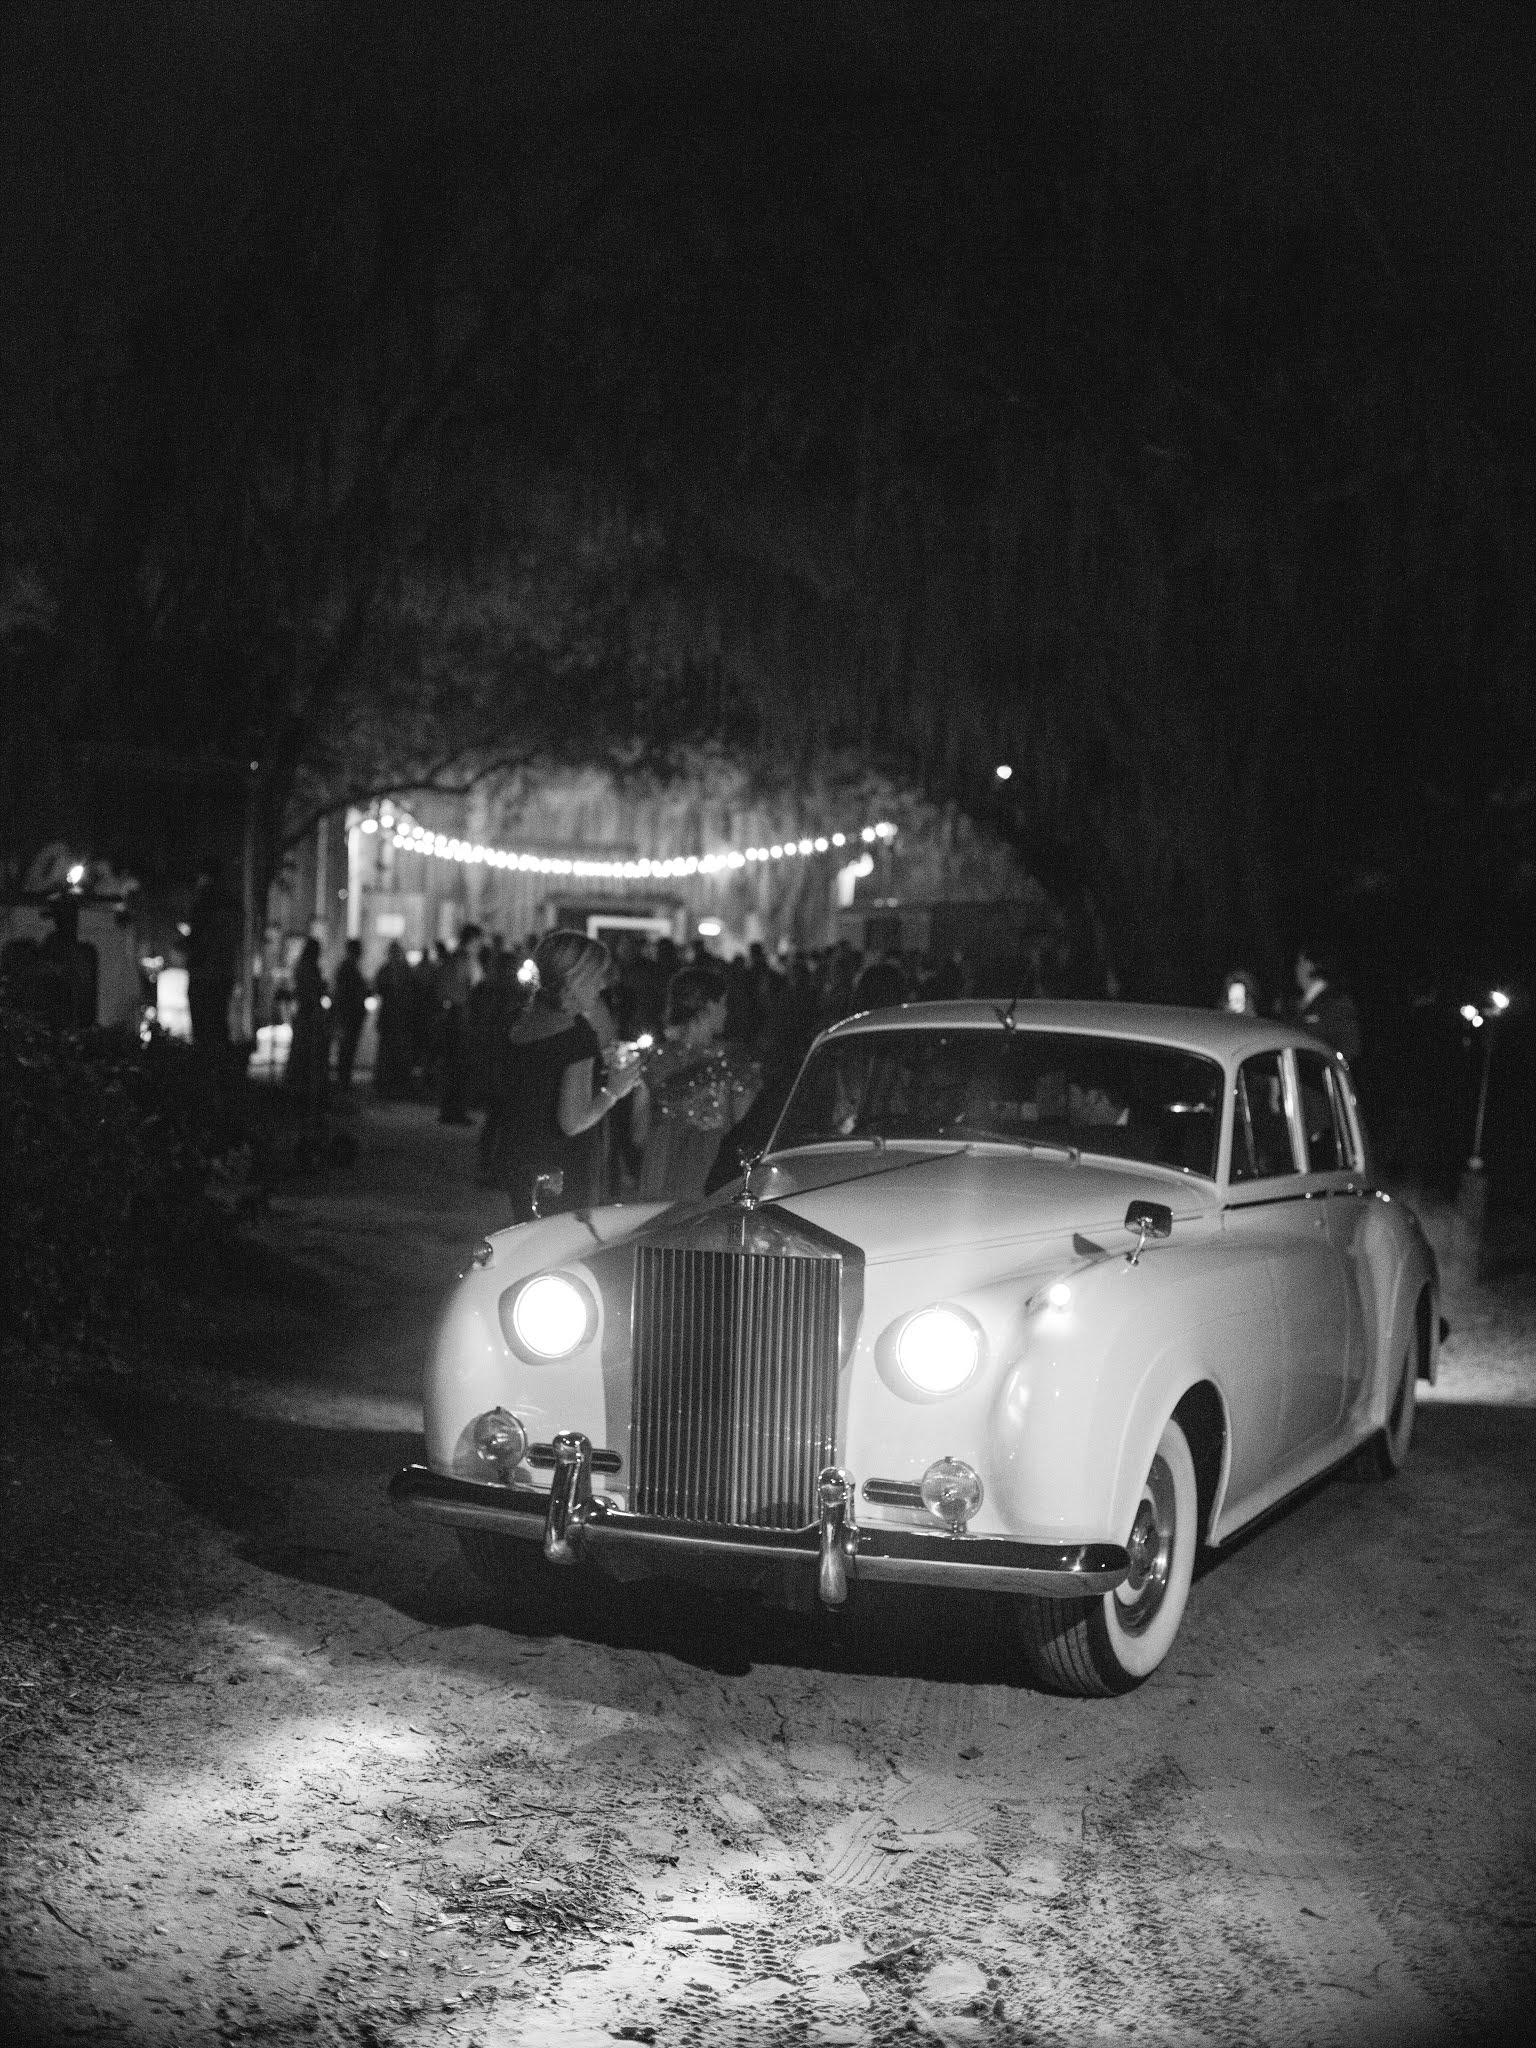 Vintage Car Wedding Transportation - Chasing Cinderella